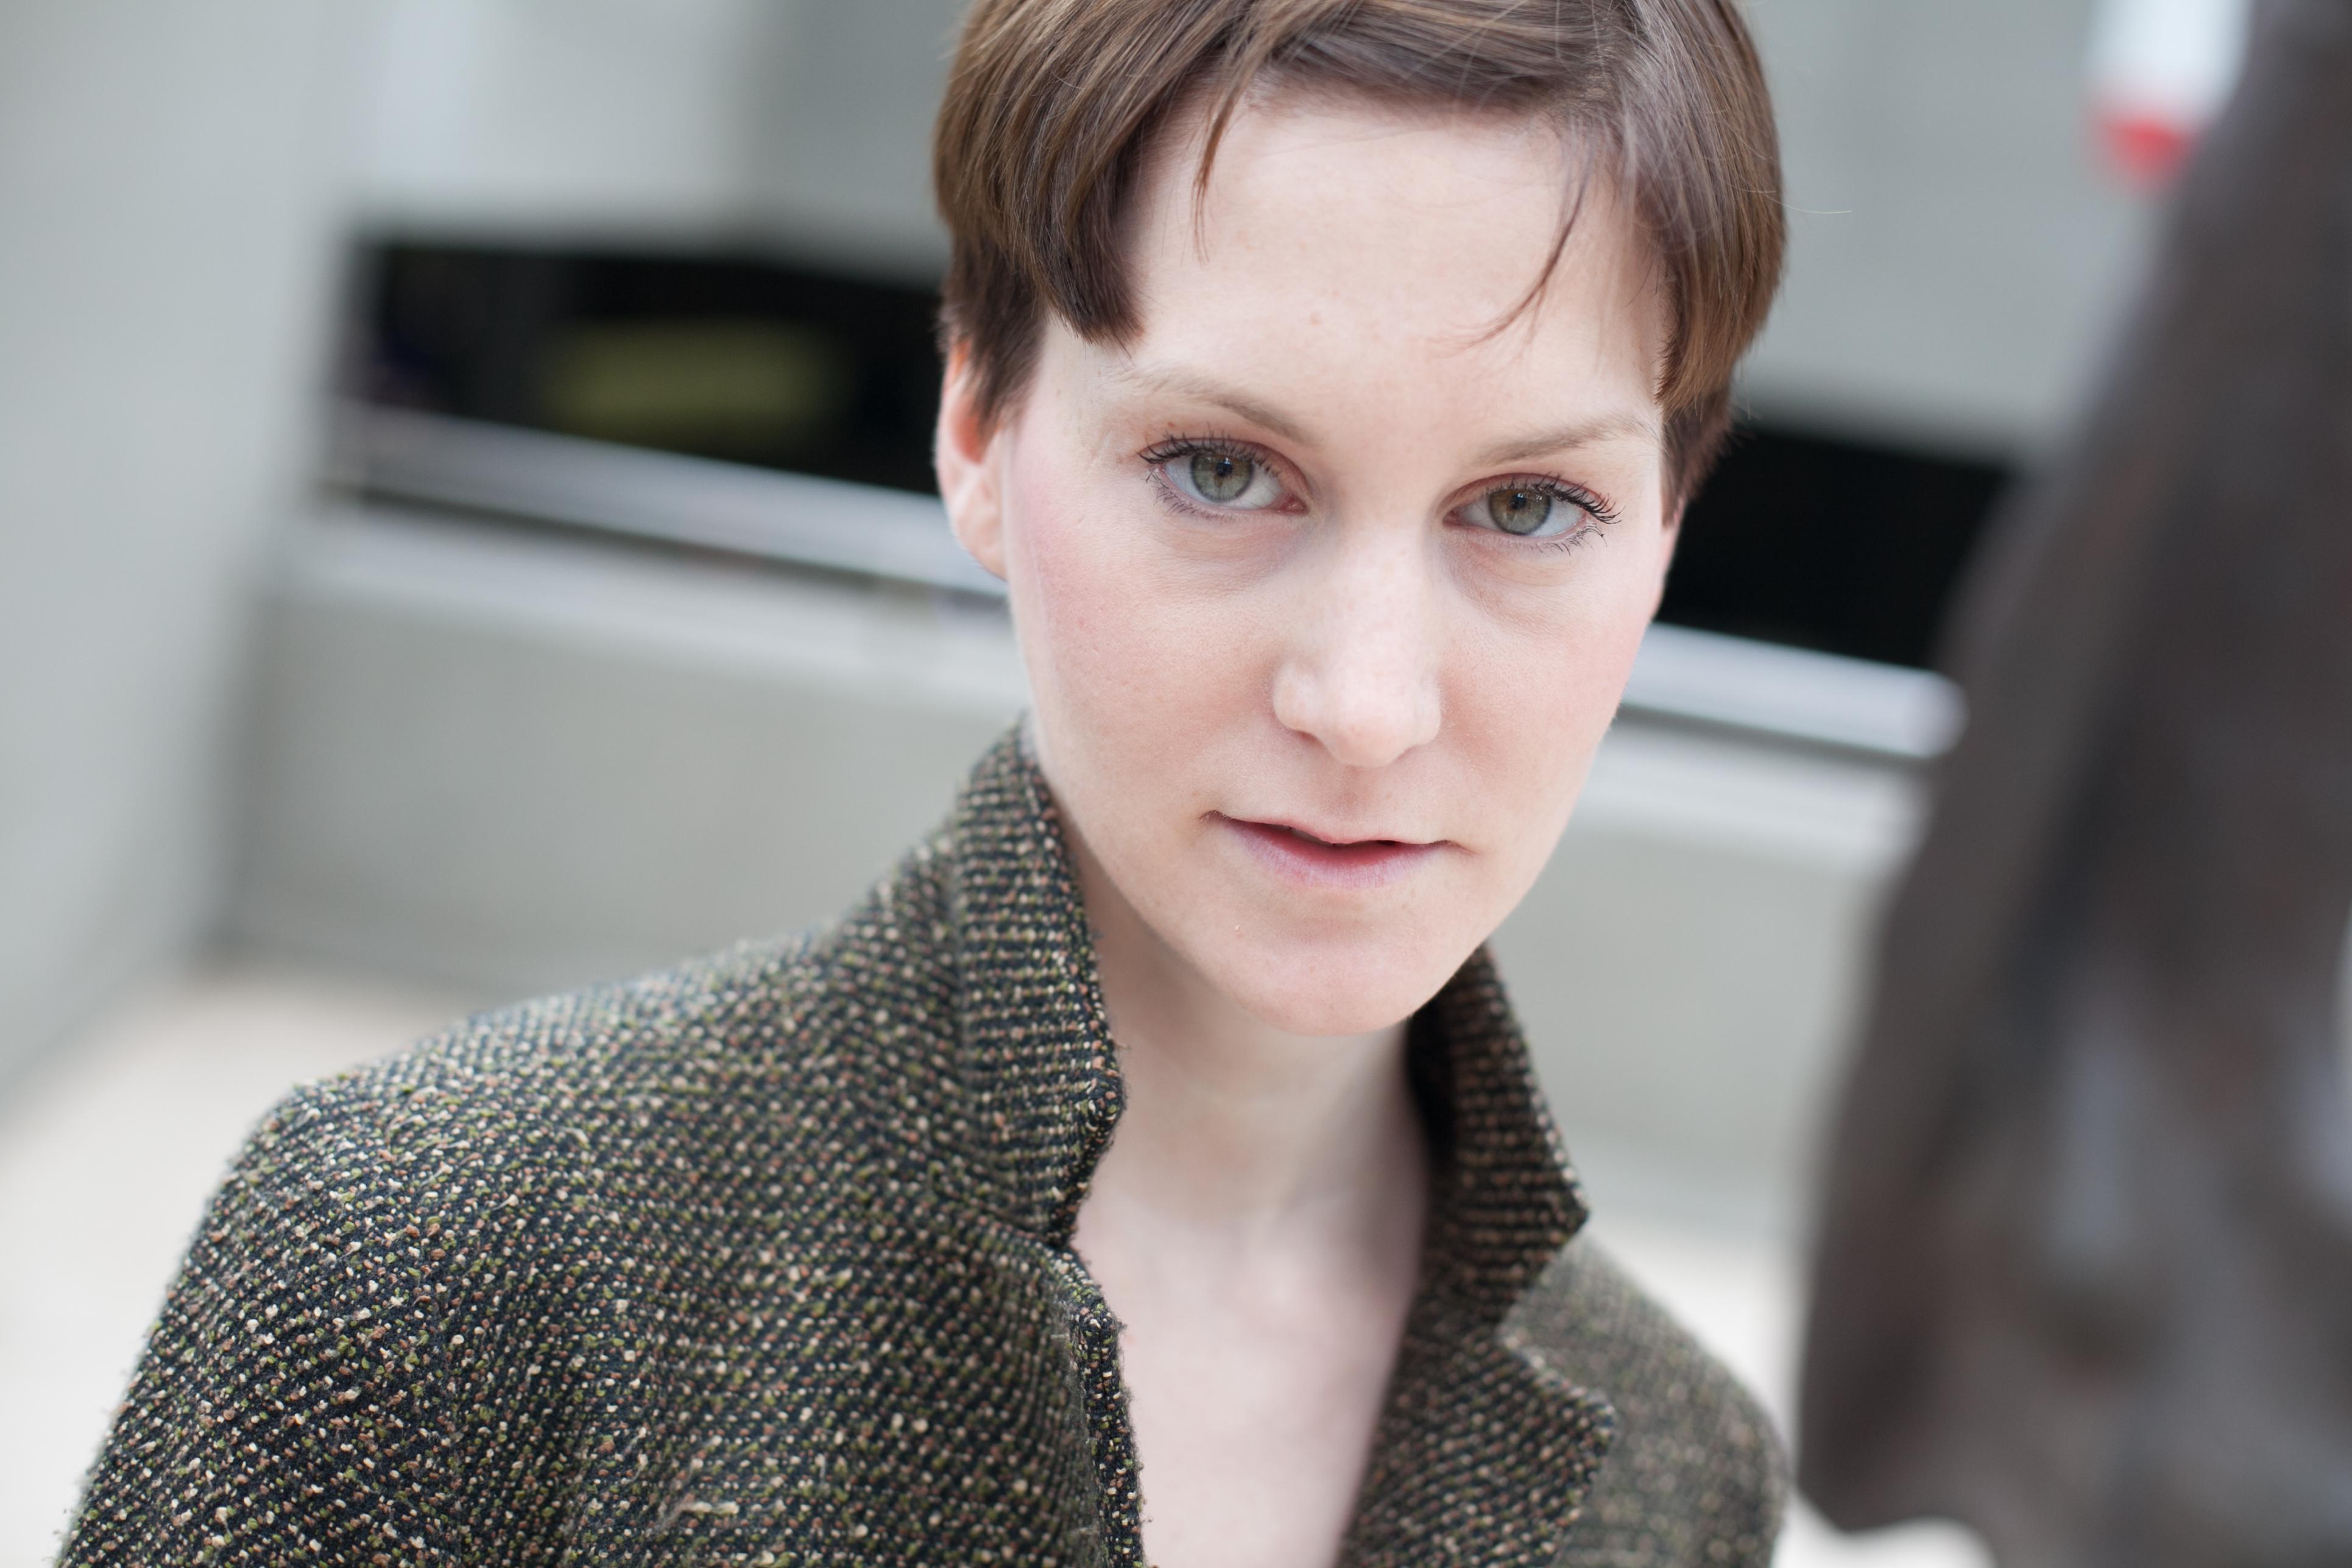 Verena Wilhelm